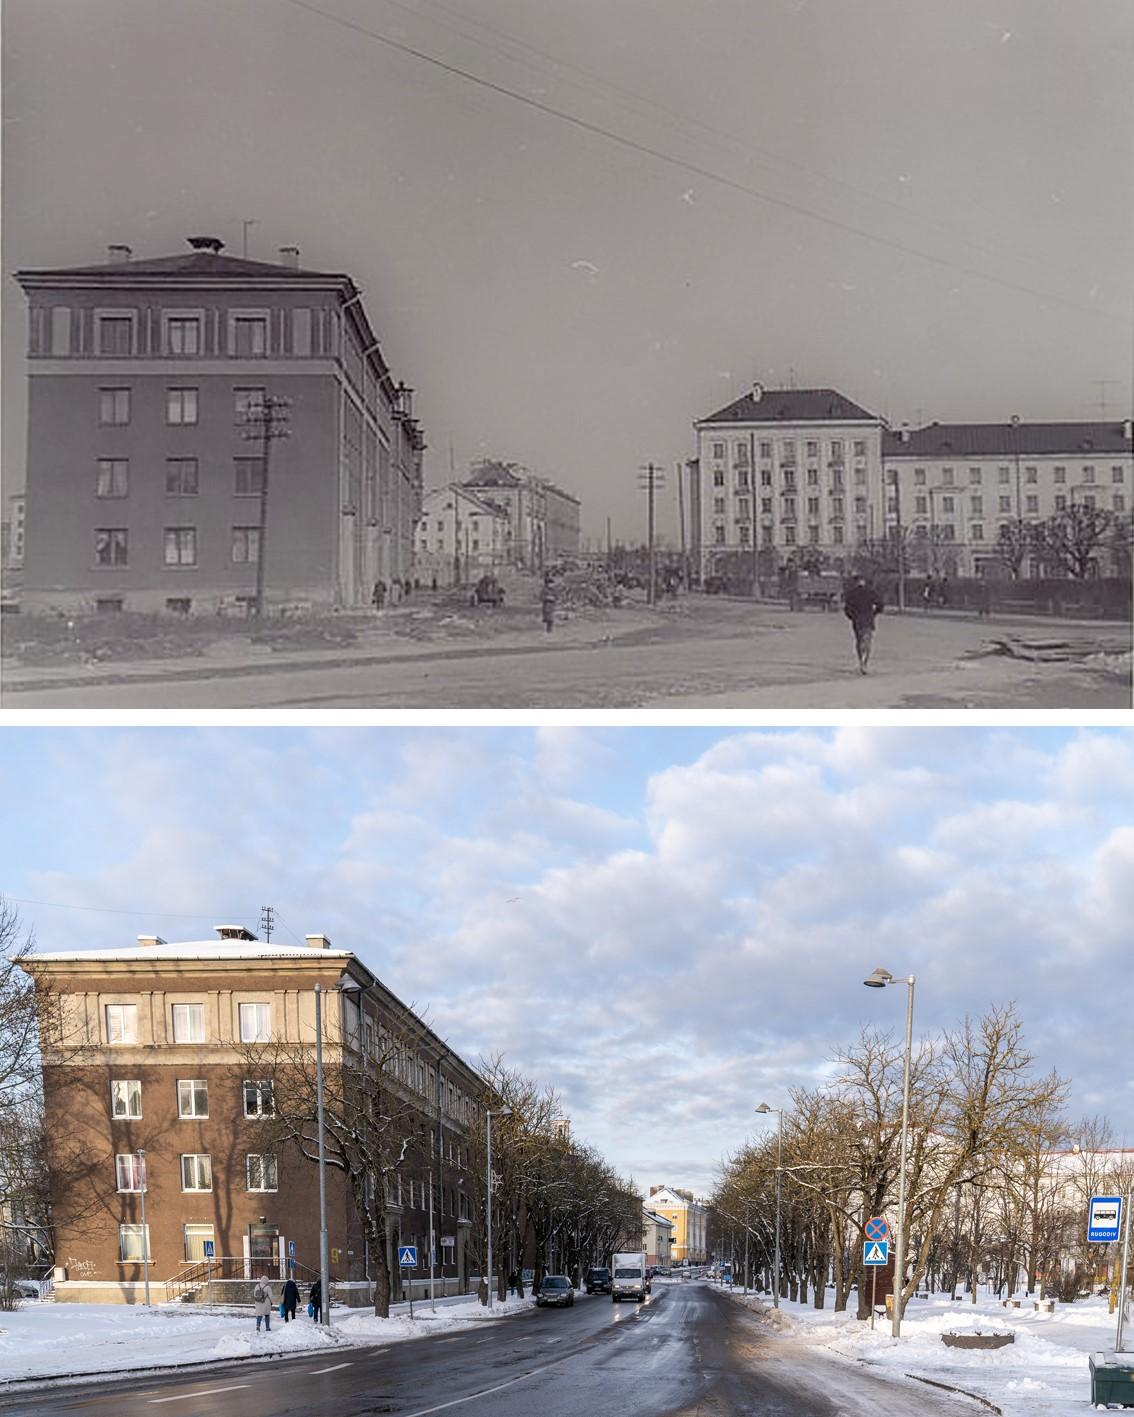 Улица Пушкина — одна из старейших и красивейших улиц Нарвы.